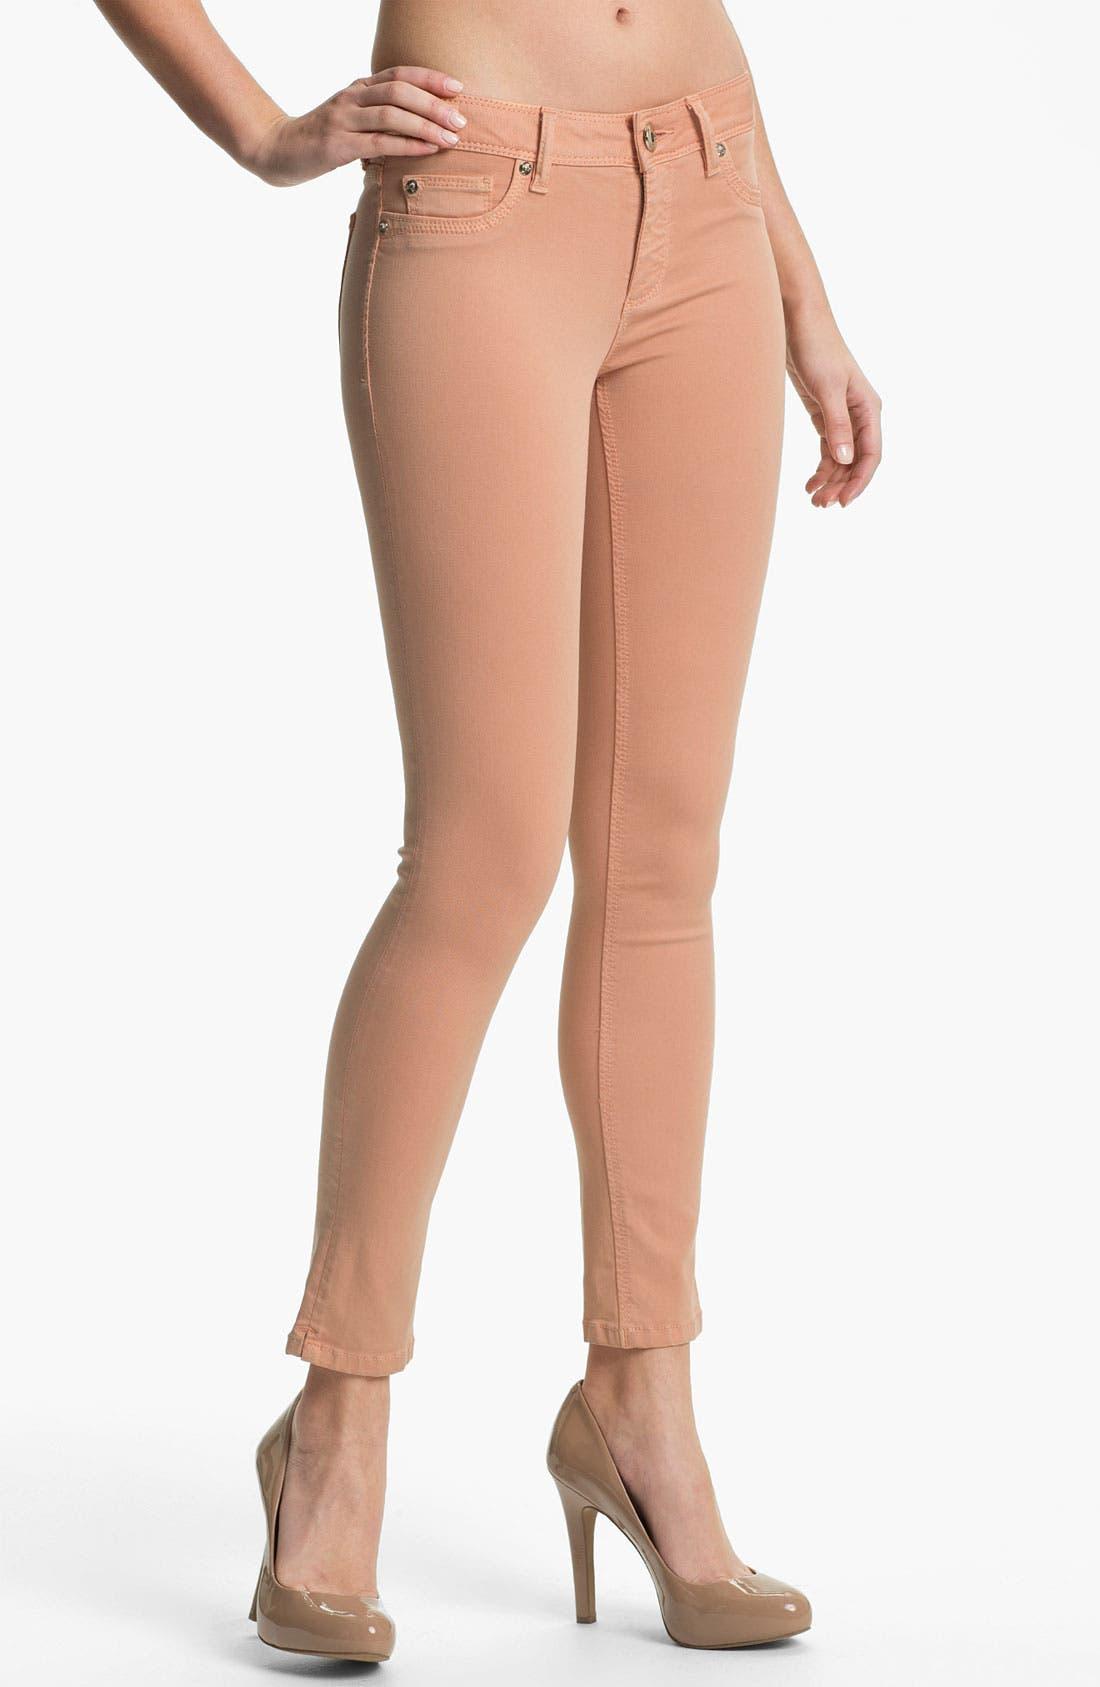 Alternate Image 1 Selected - DL1961 'Angel' X-Fit Stretch Denim Skinny Ankle Jeans (Nice)